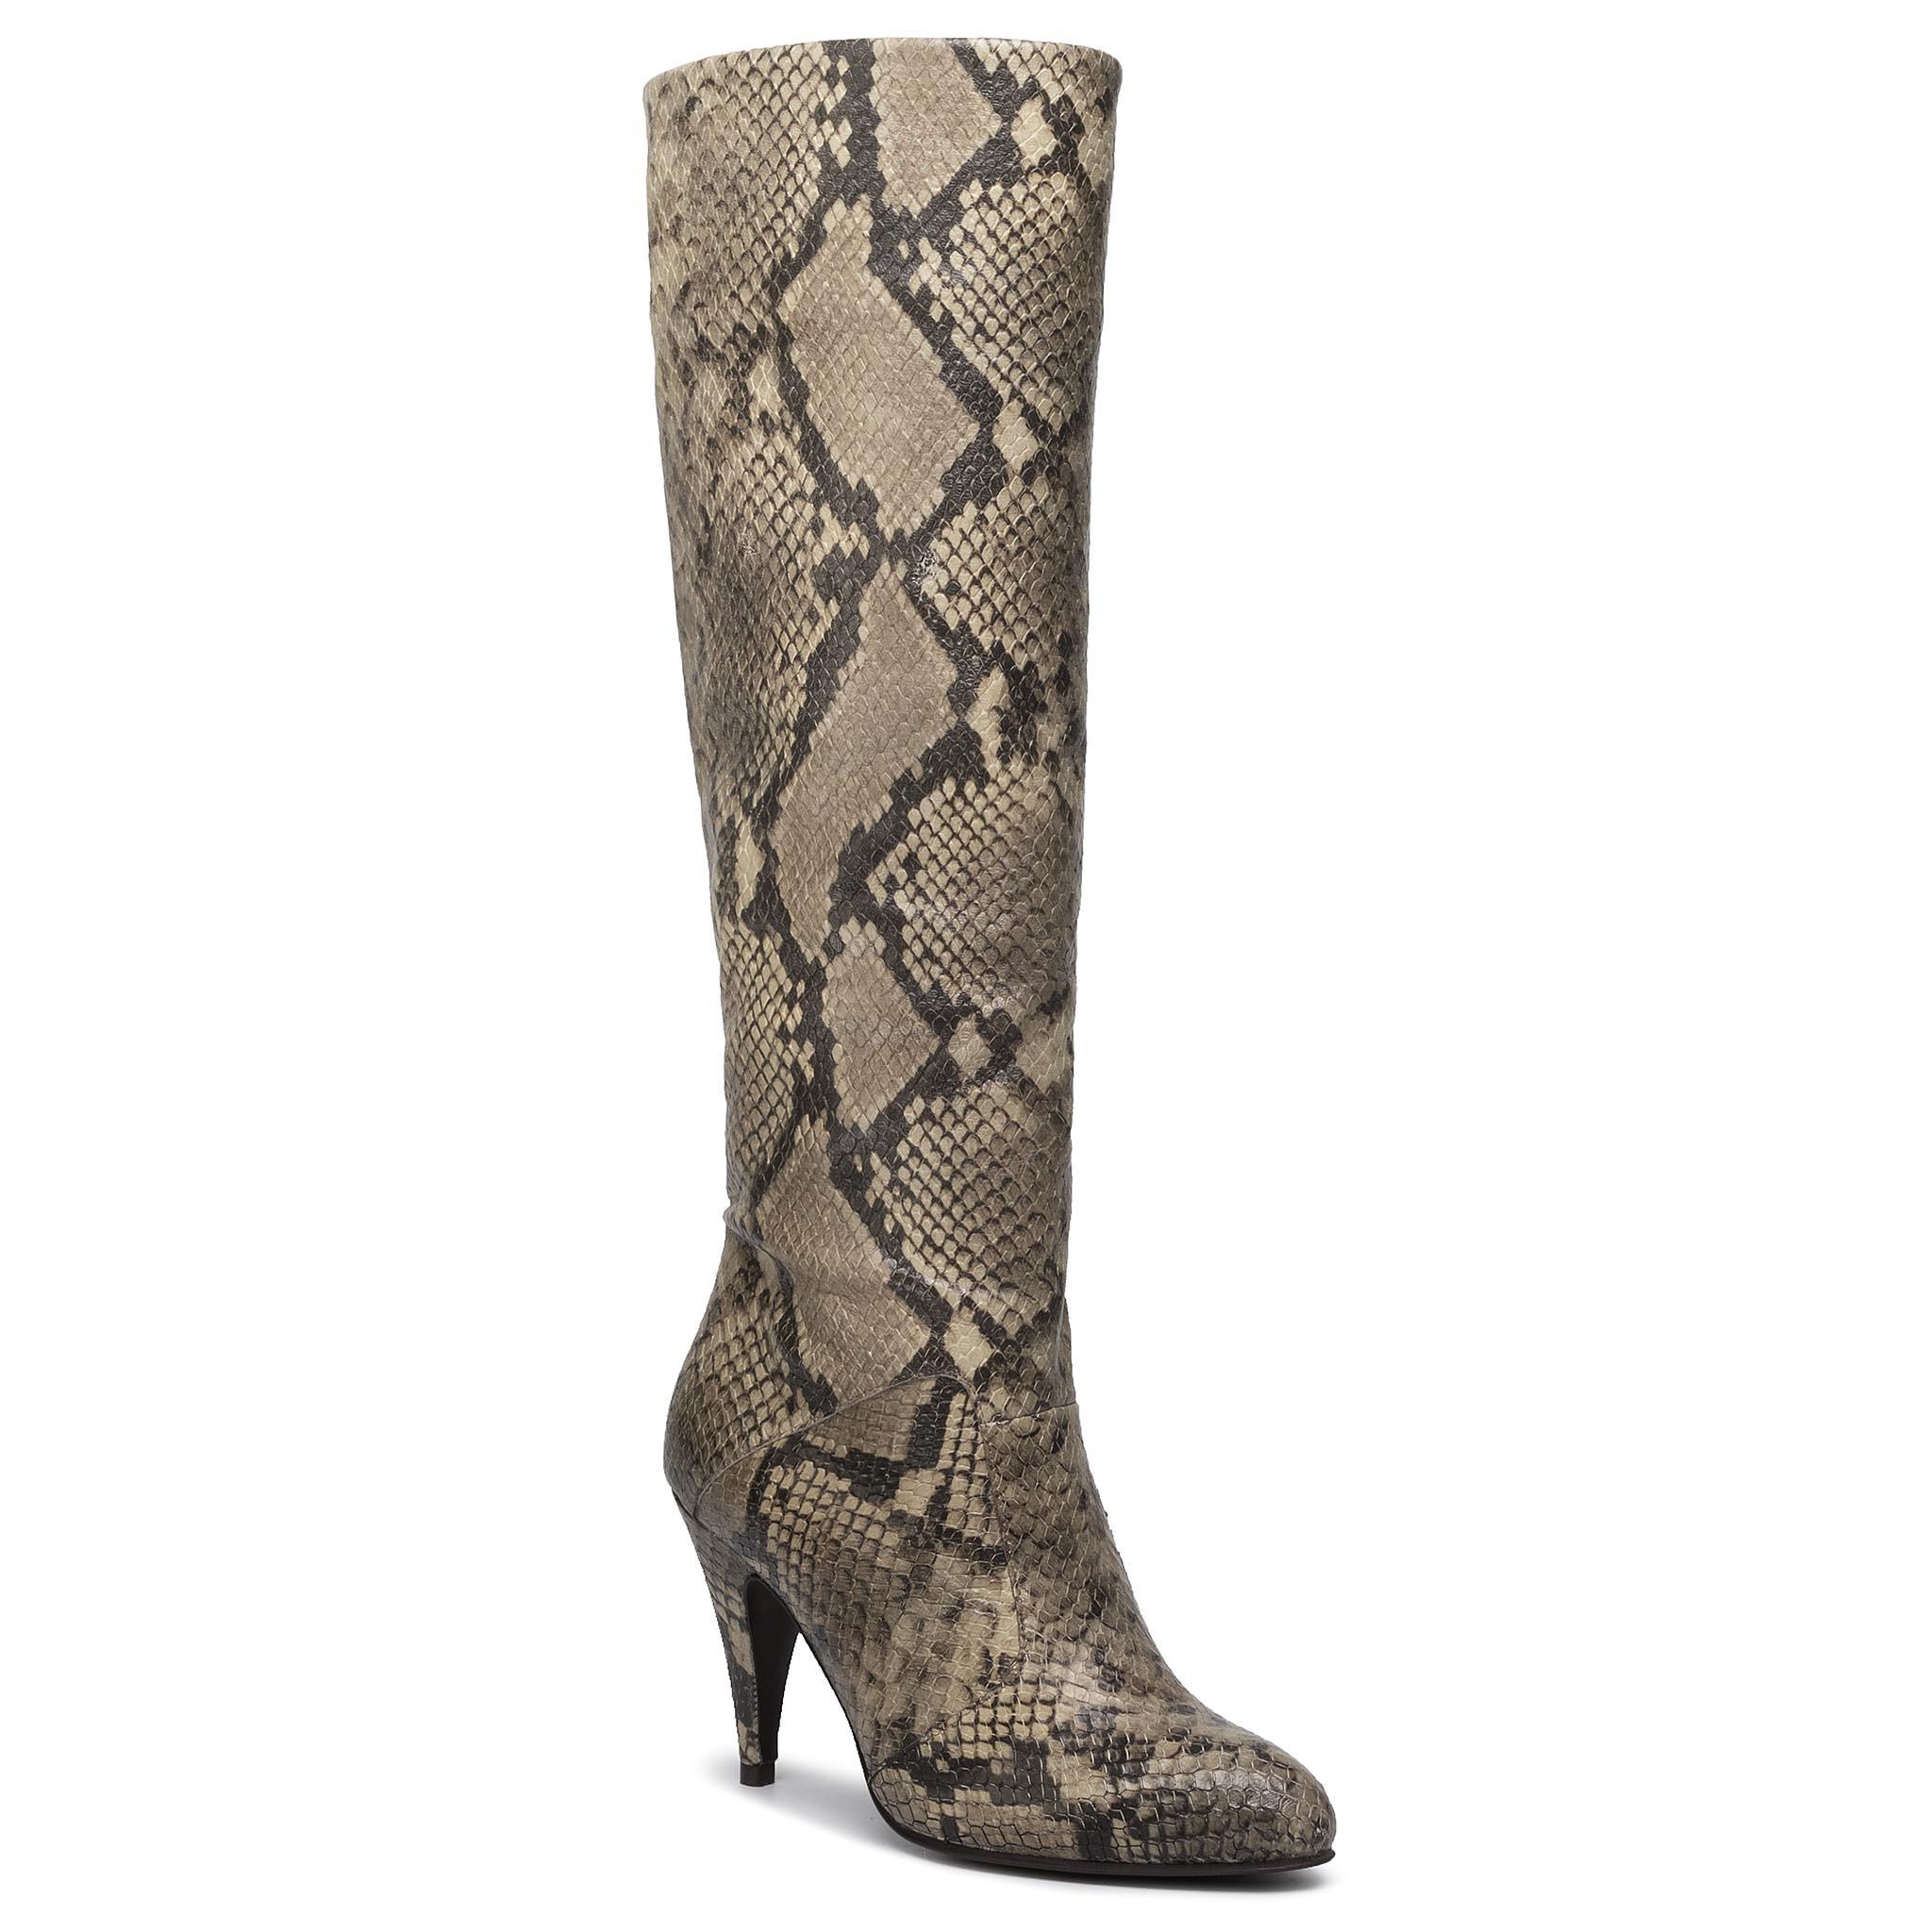 Cizme TOMMY HILFIGER - Zendaya Snake Print Boot FW0FW04565 Snake Skin 0HG